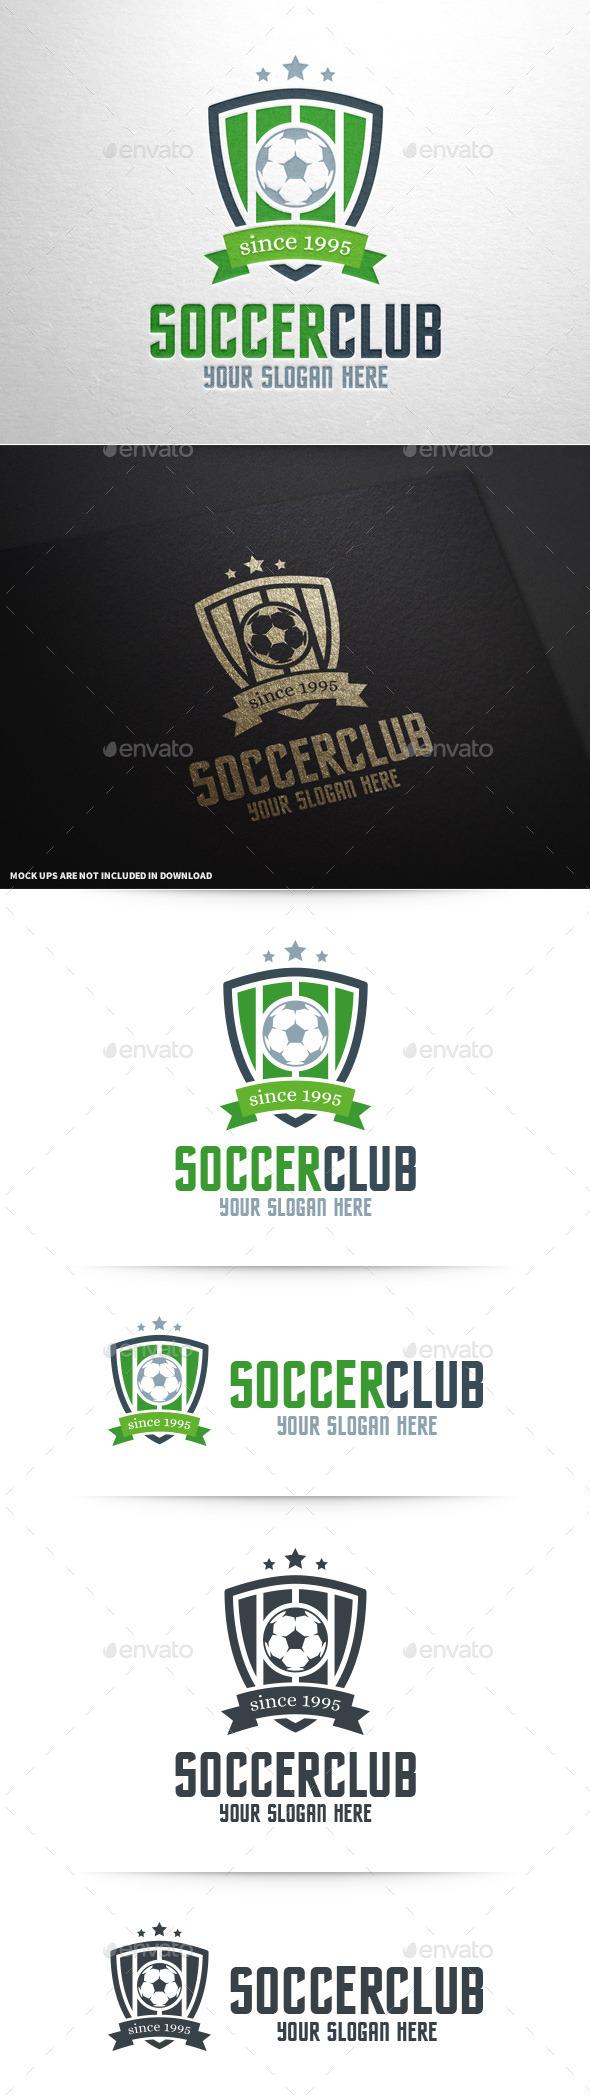 GraphicRiver Soccer Club Logo Template 11140029